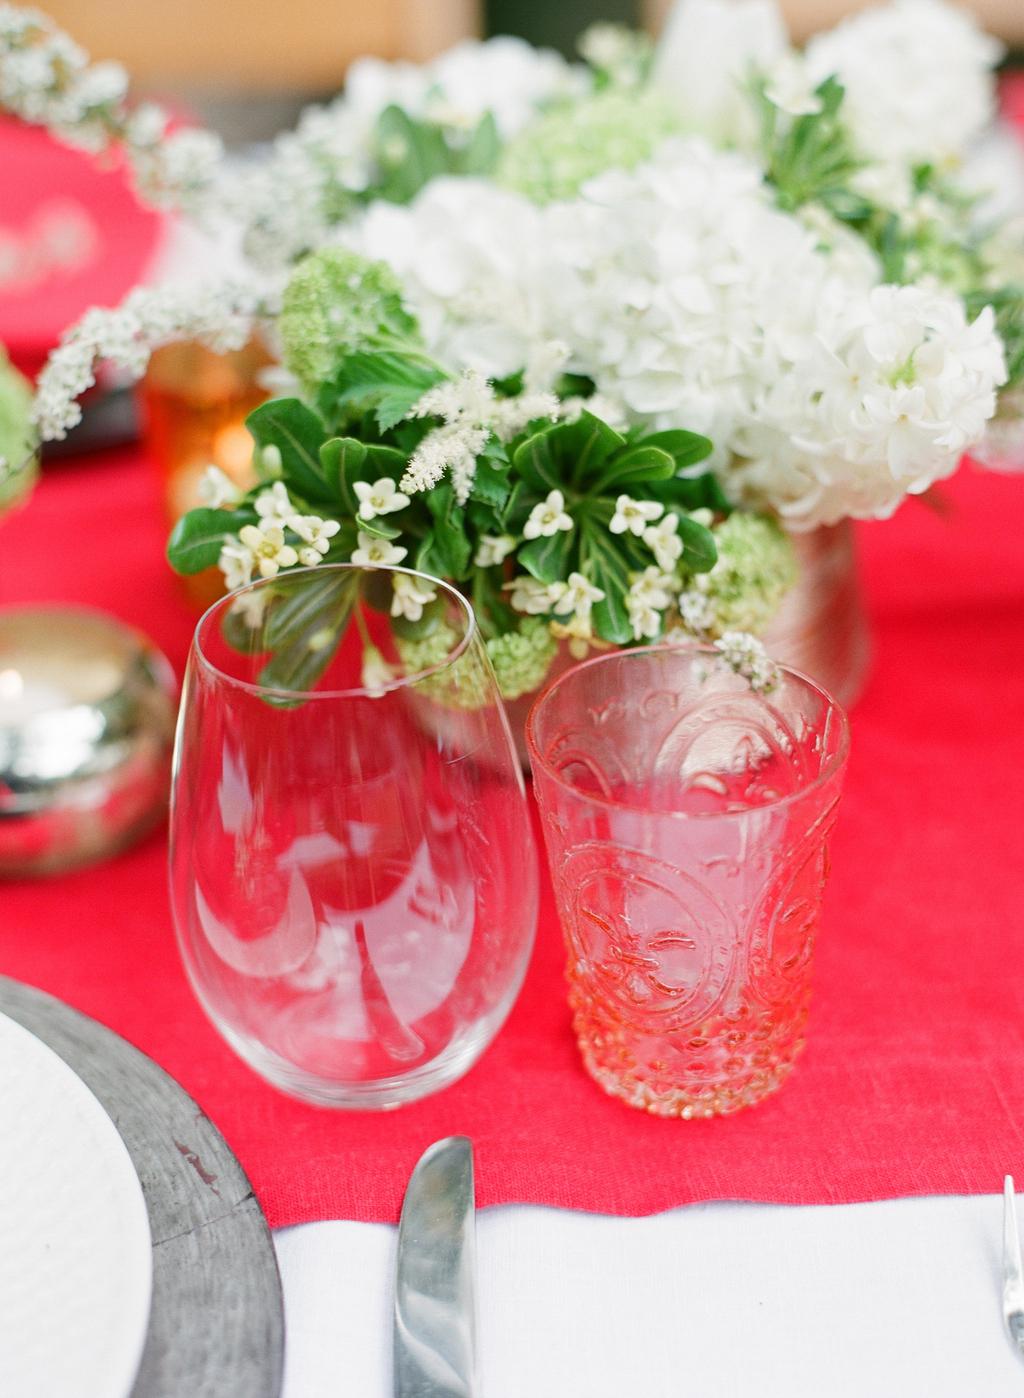 Styled-wedding-santa-barbara-chic-beaux-arts-photographie-italian-bohemian-wedding-venue-table-setting-red-white-flowers-antique-glass-066.full